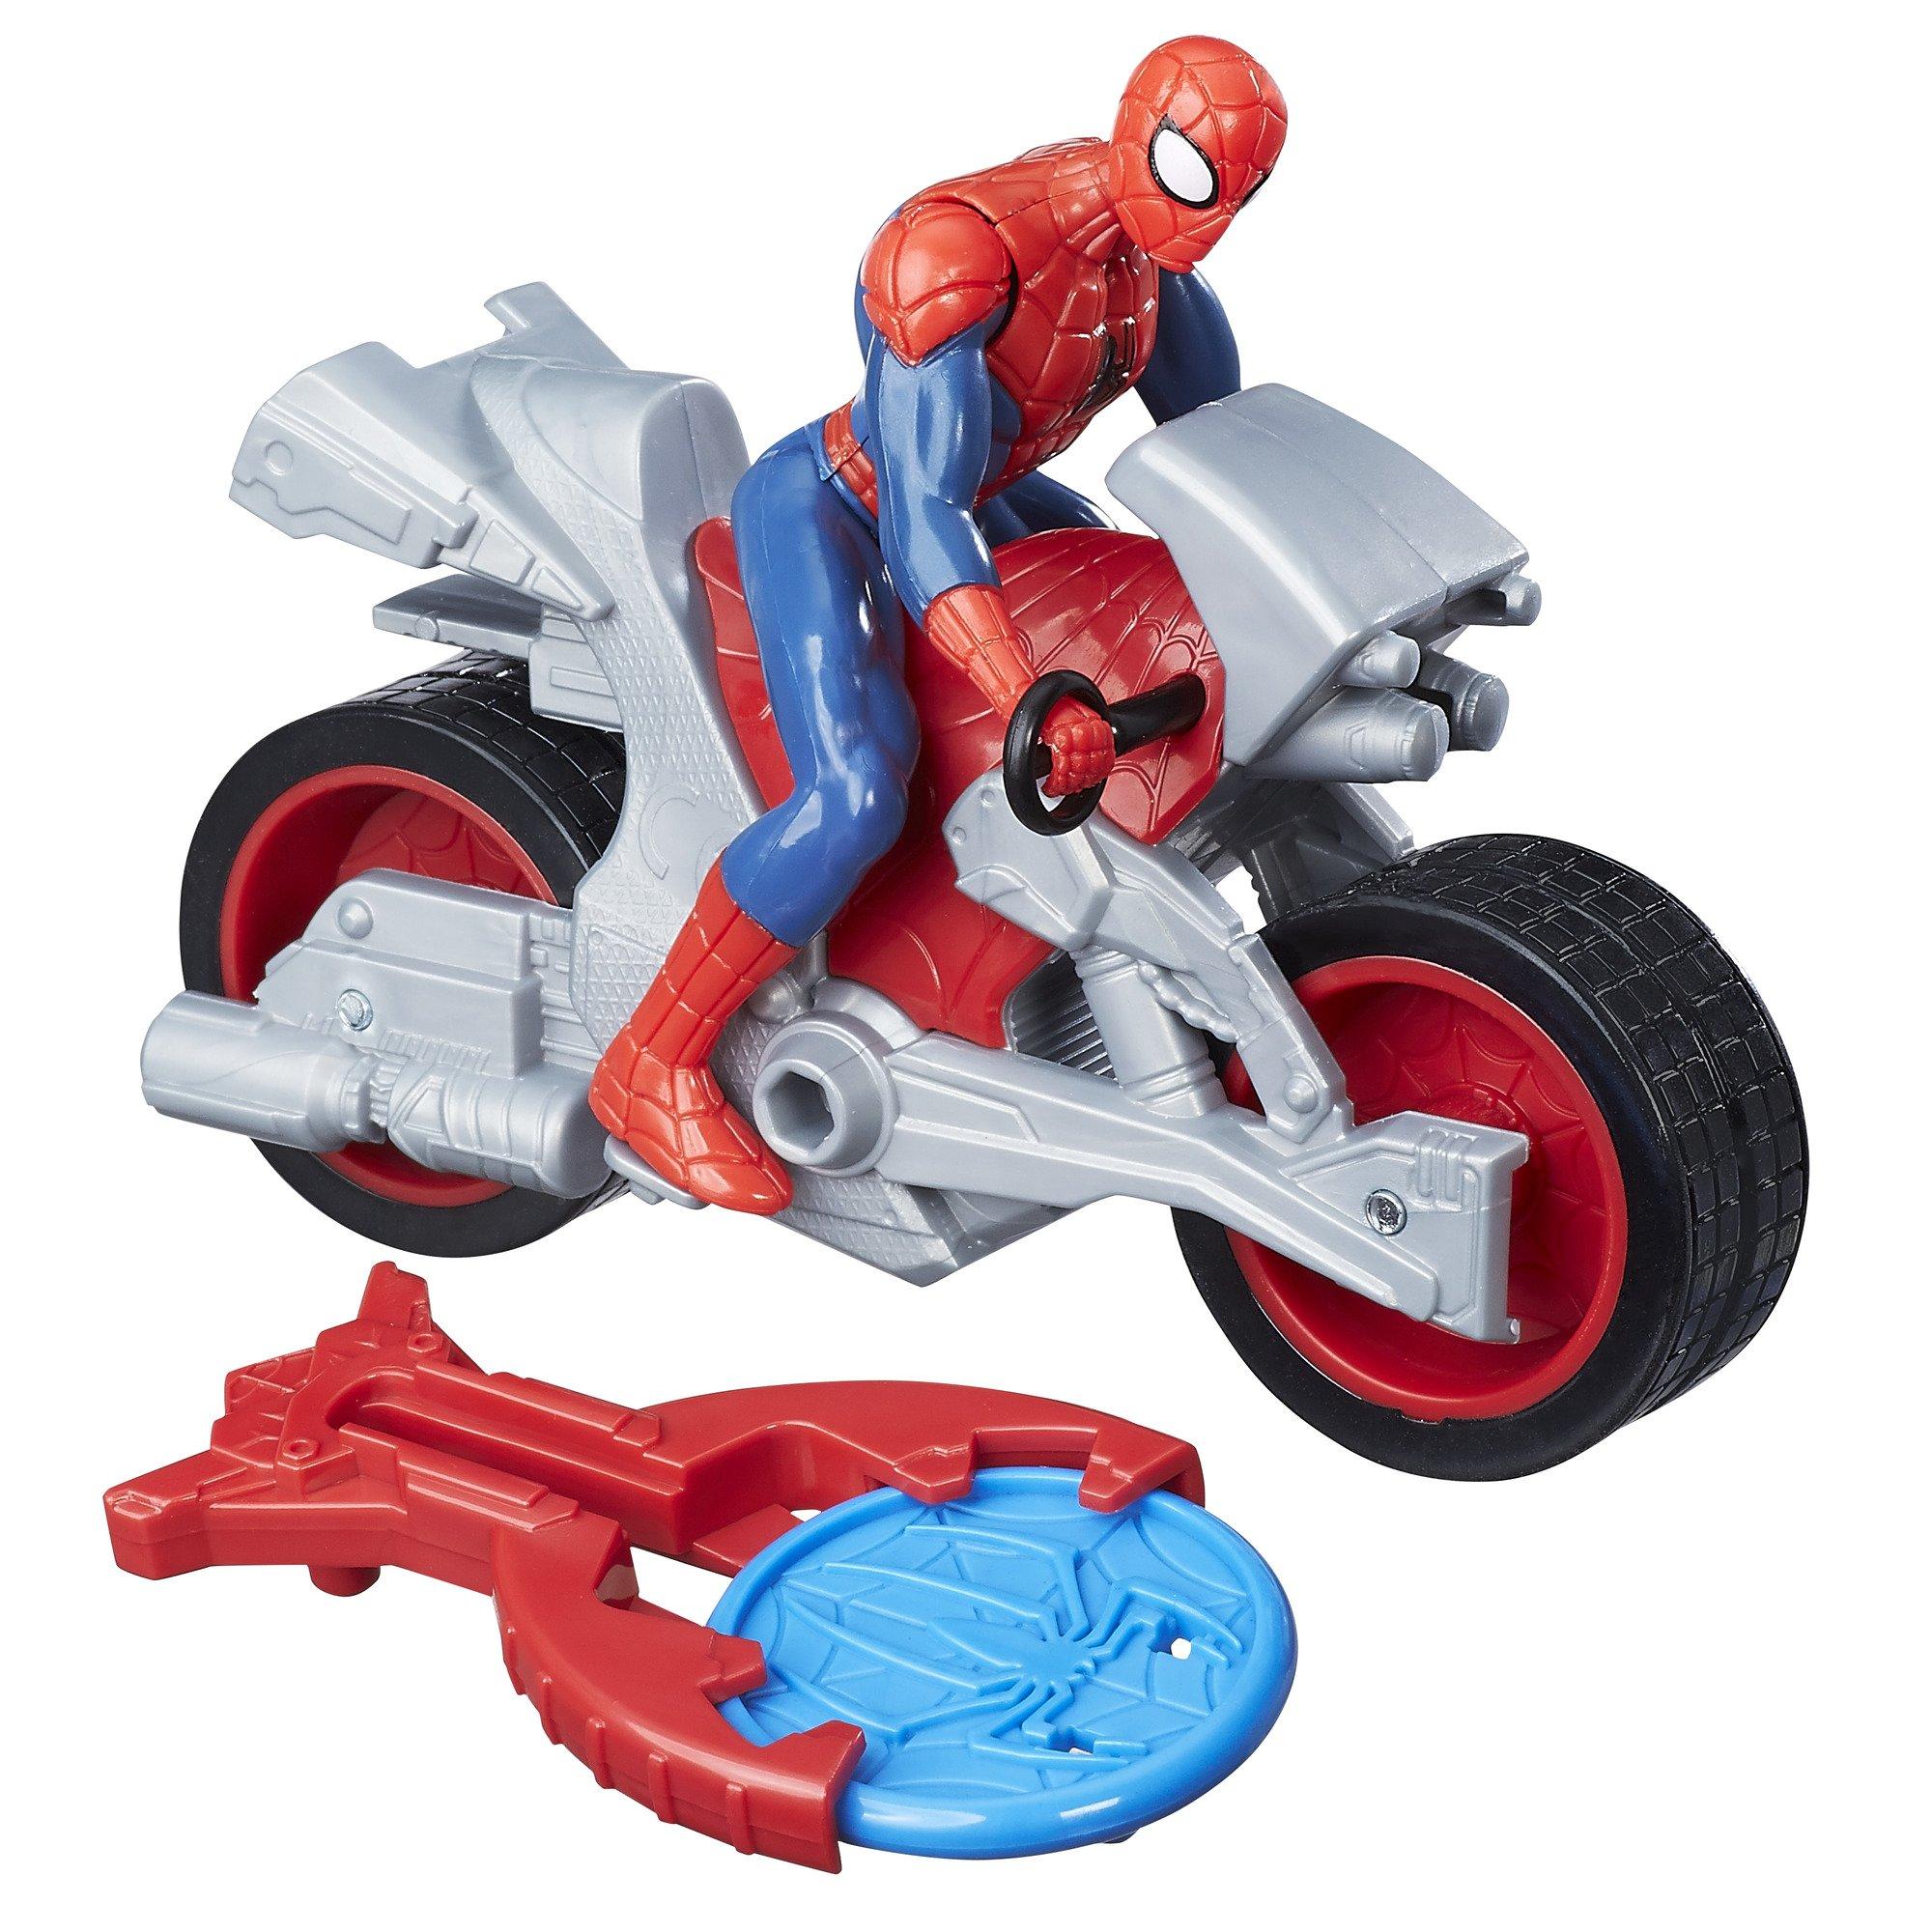 Marvel Spiderman Blast & Go Spider Man B9994